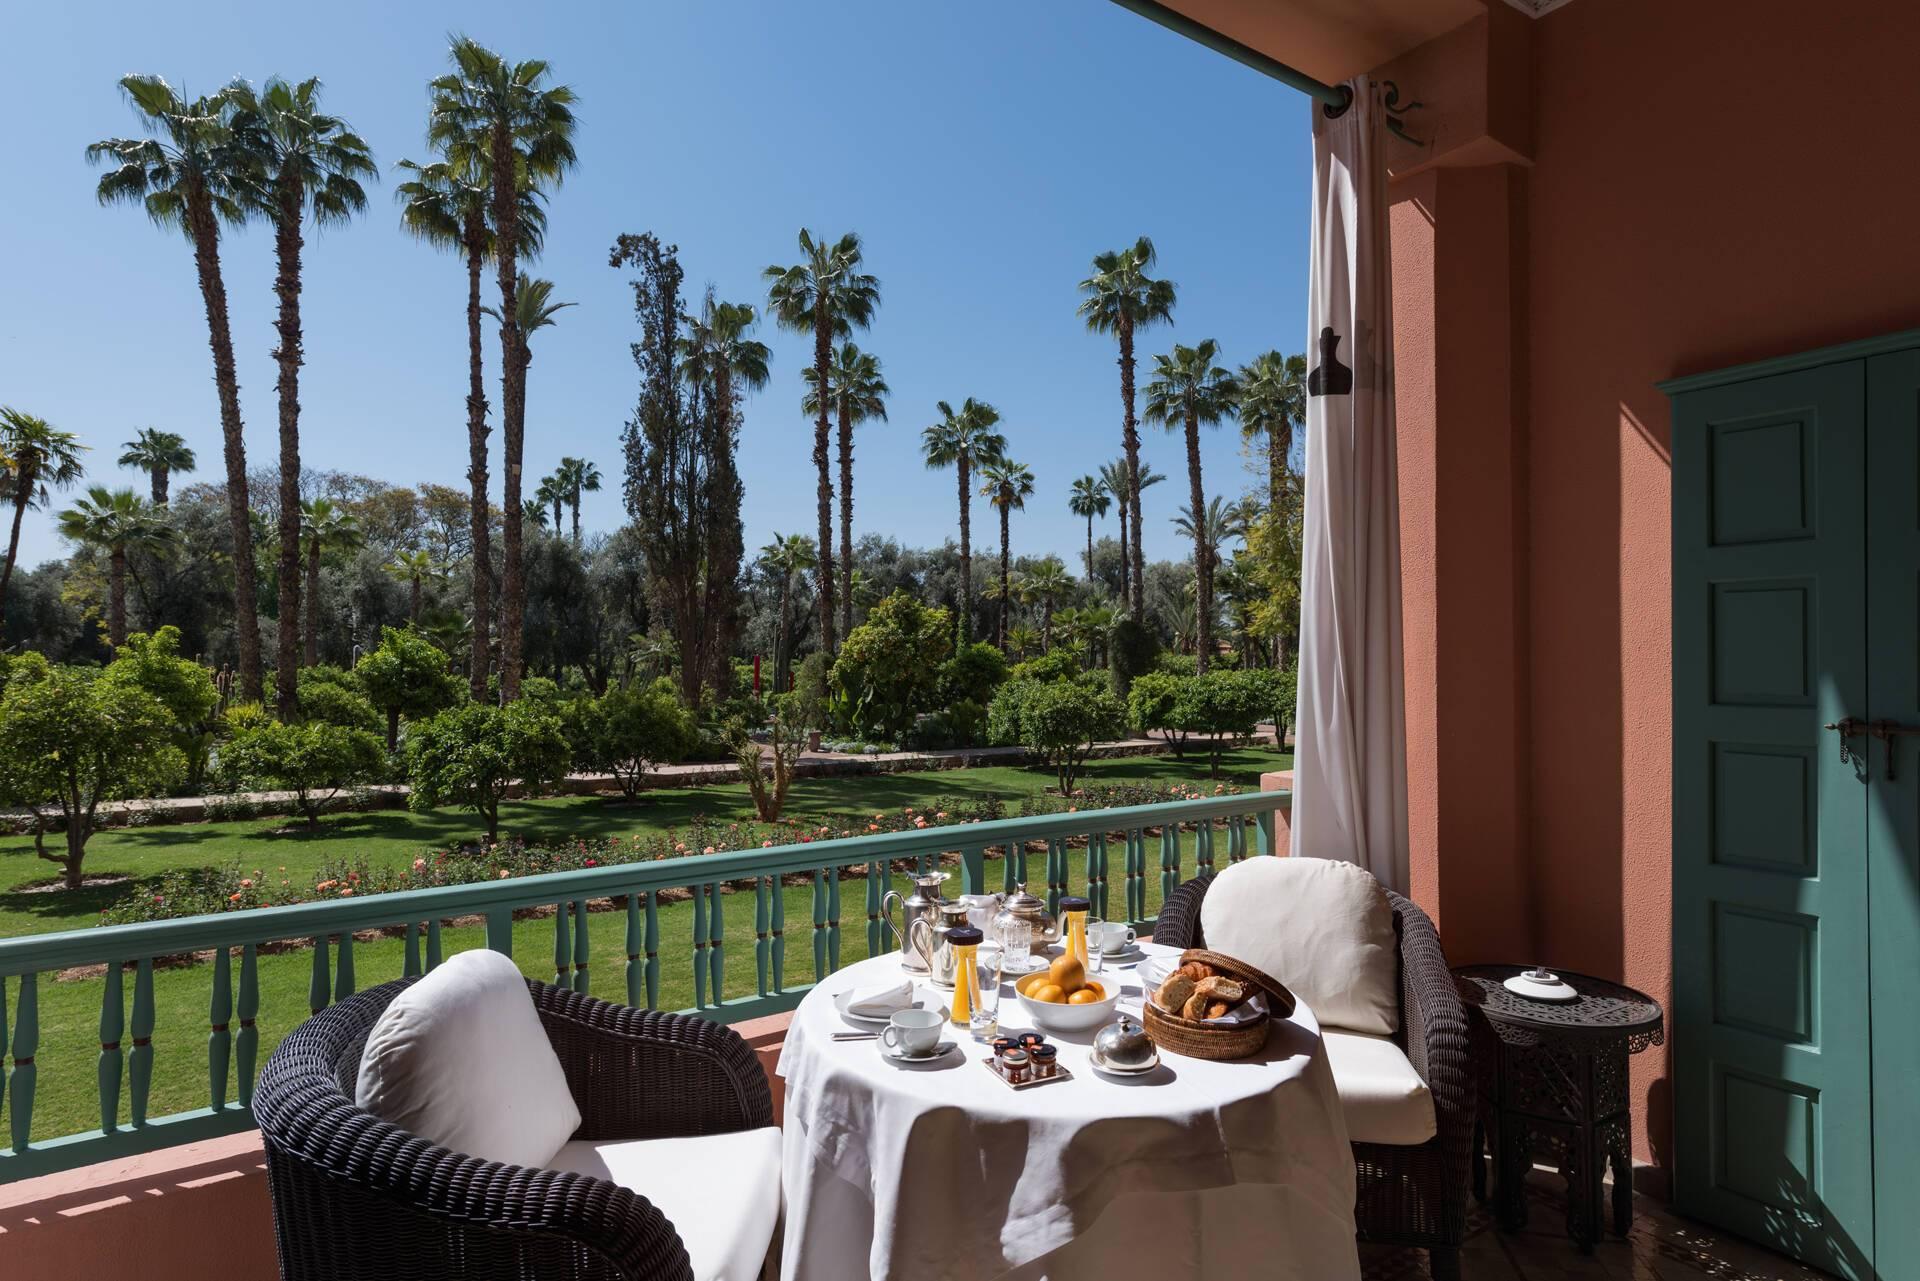 Mamounia Deluxe Room Terrasse Marrakech